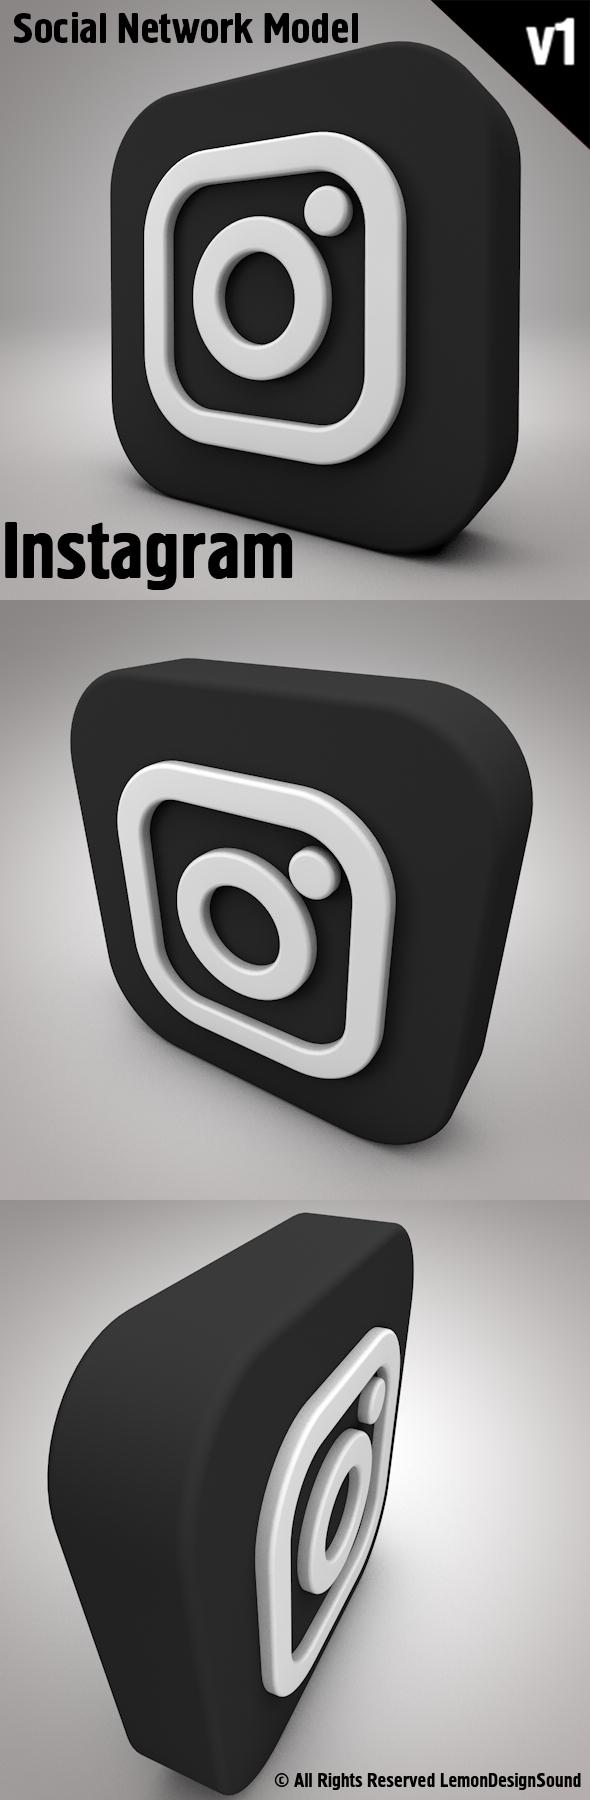 Instagram - 3DOcean Item for Sale